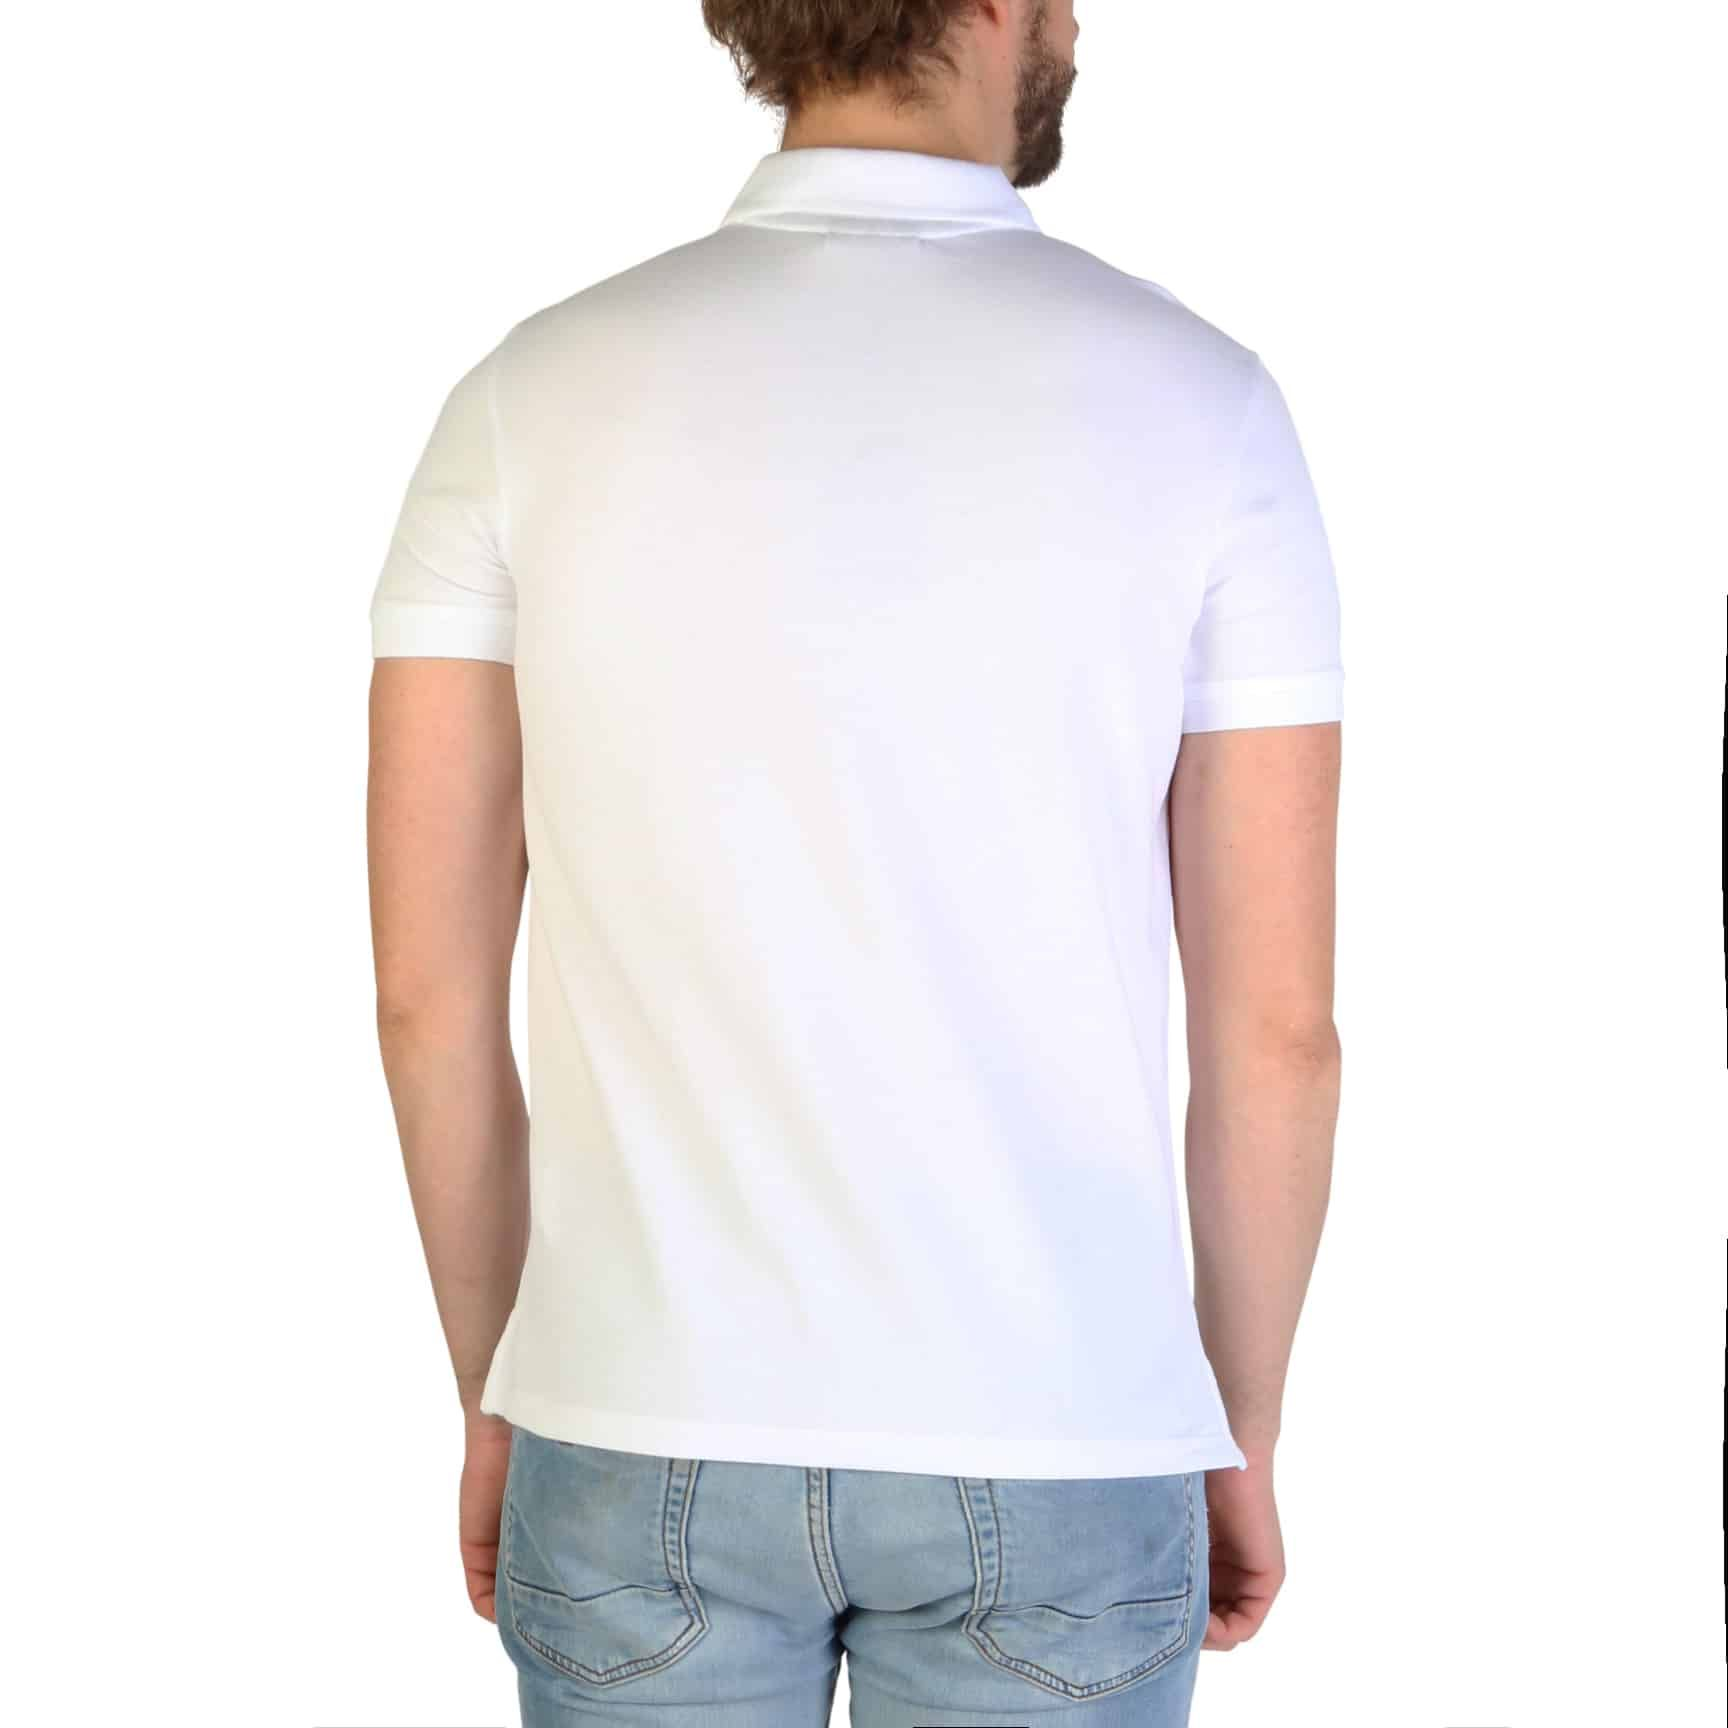 Emporio Armani – 8N1F12 – Bianco